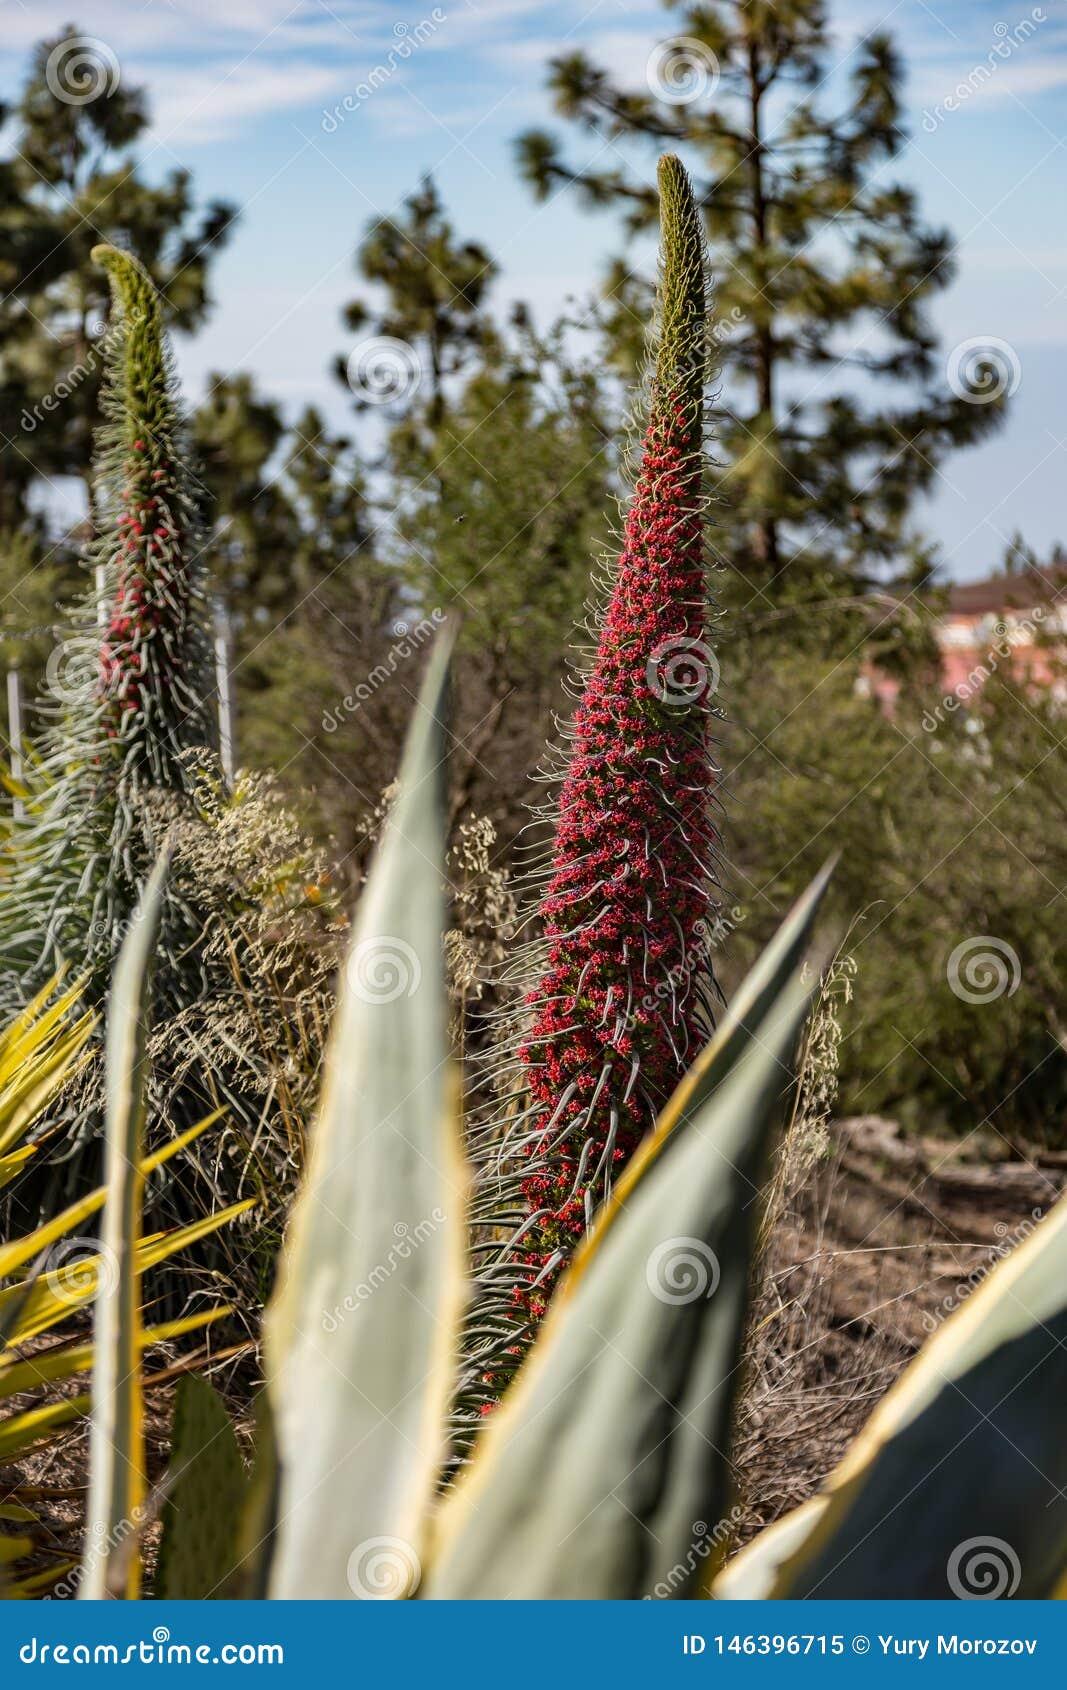 Blooming Tajinaste Flower. Vilaflor, Tenerife, Canary Islands